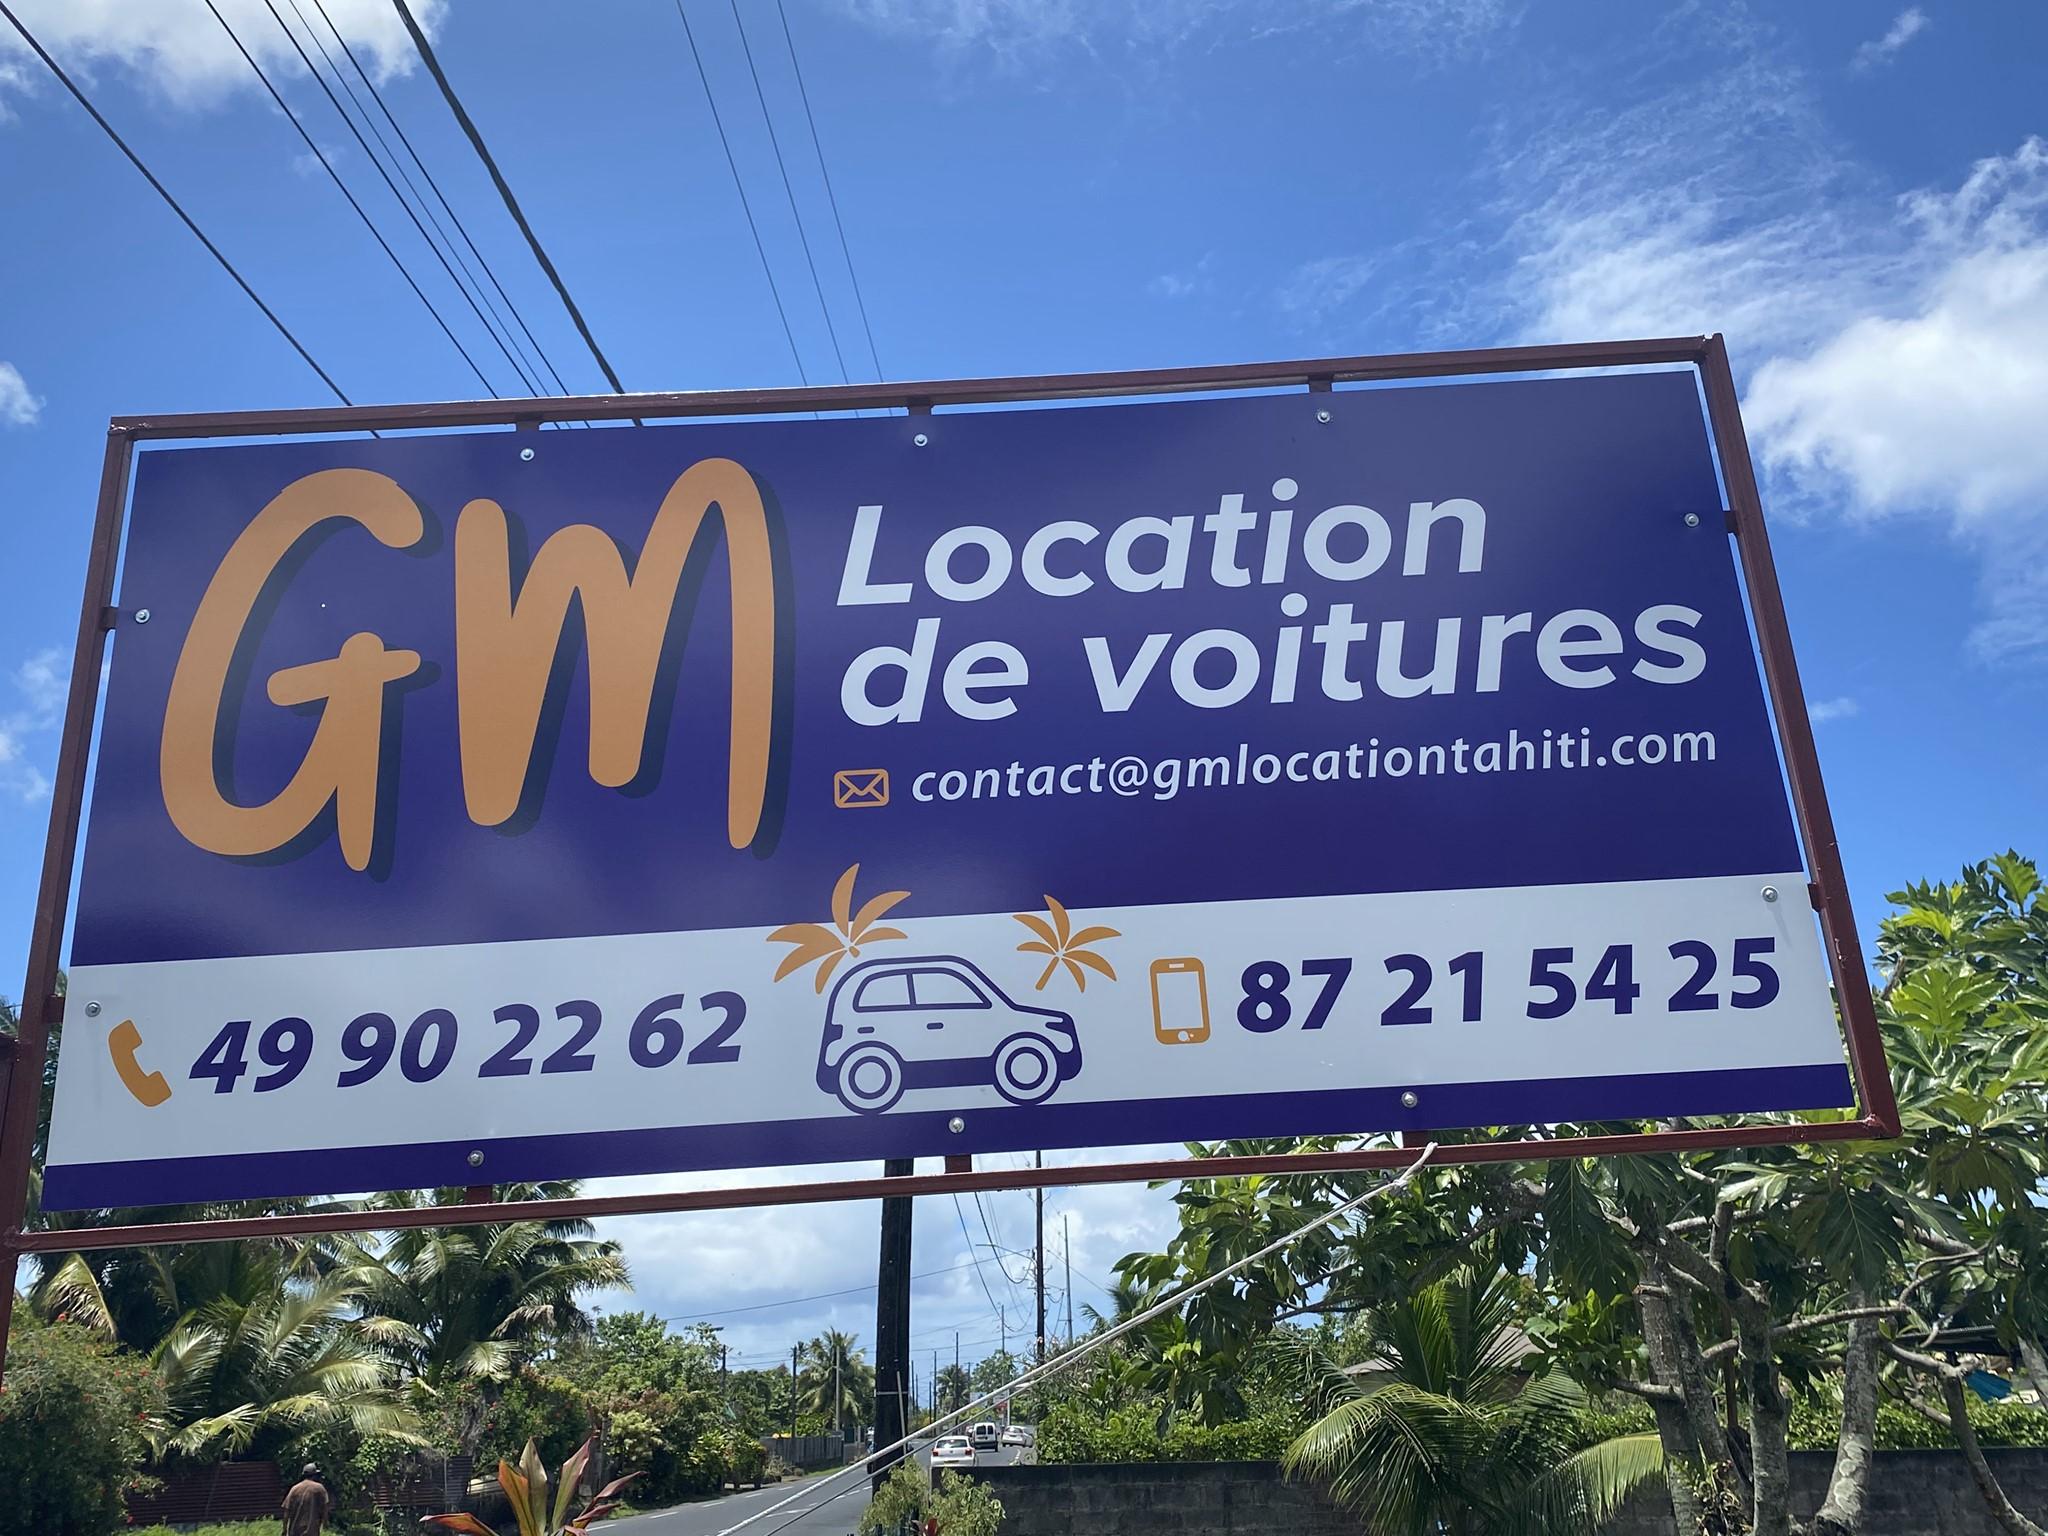 https://tahititourisme.fr/wp-content/uploads/2020/03/gmlocationphotodecouverture.jpg